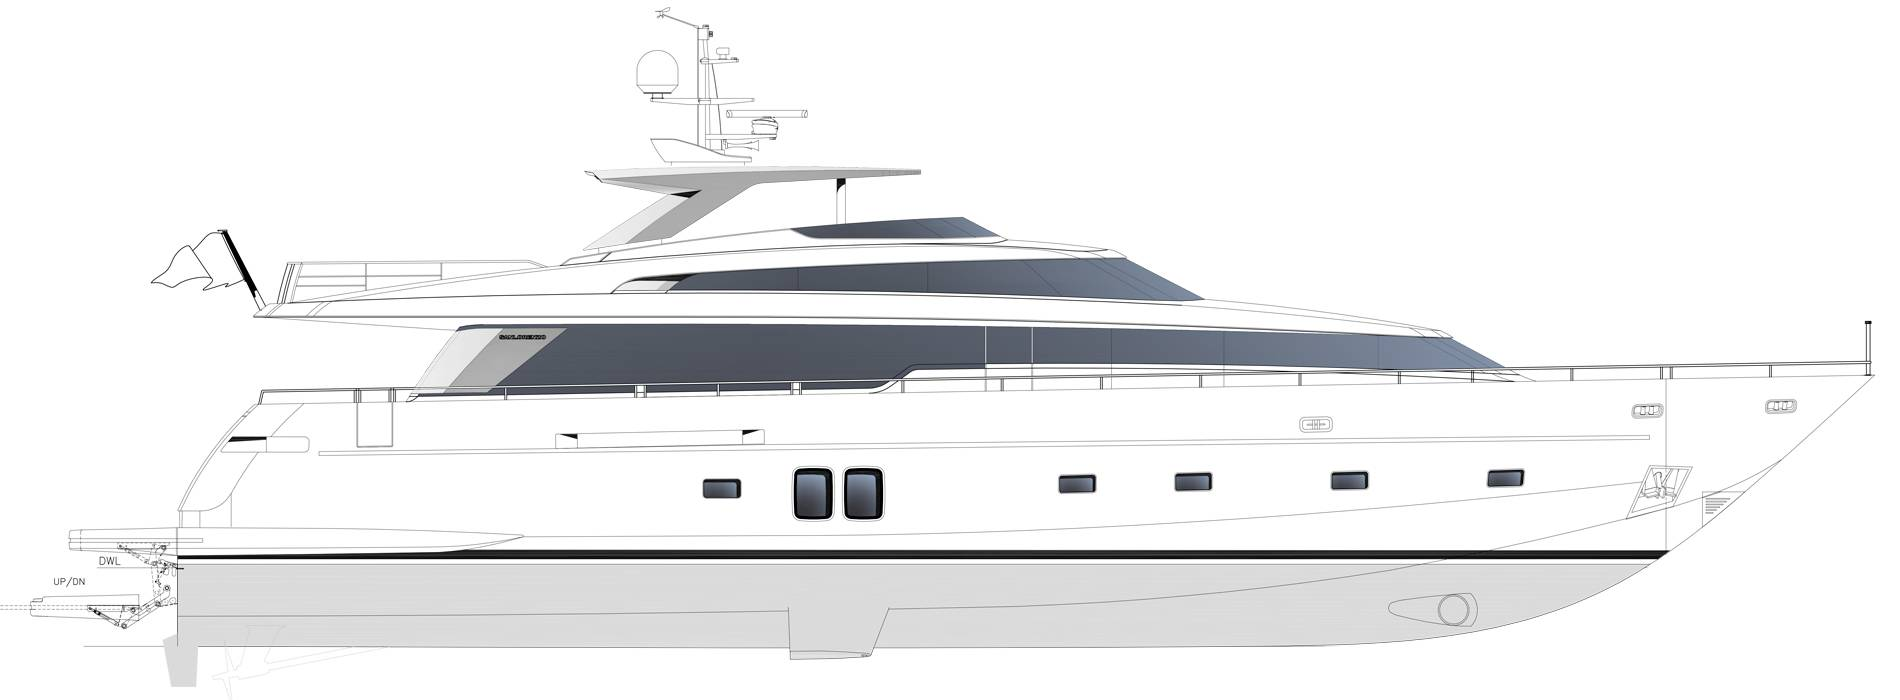 Sanlorenzo Yachts SL96-635 under offer Profilo